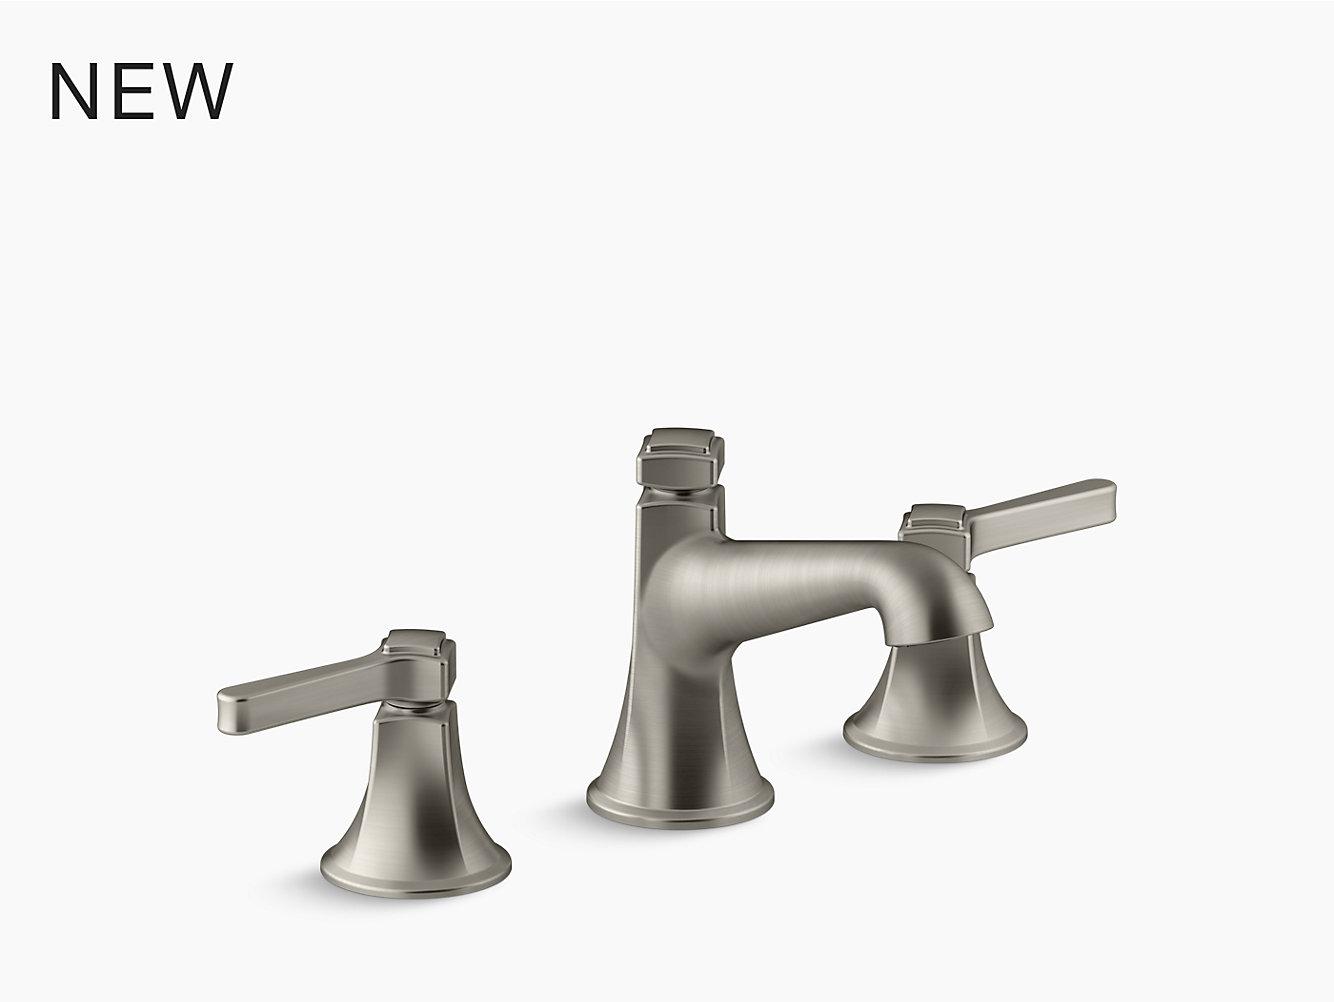 fairfax single control bathroom sink faucet k 12181 kohler view larger